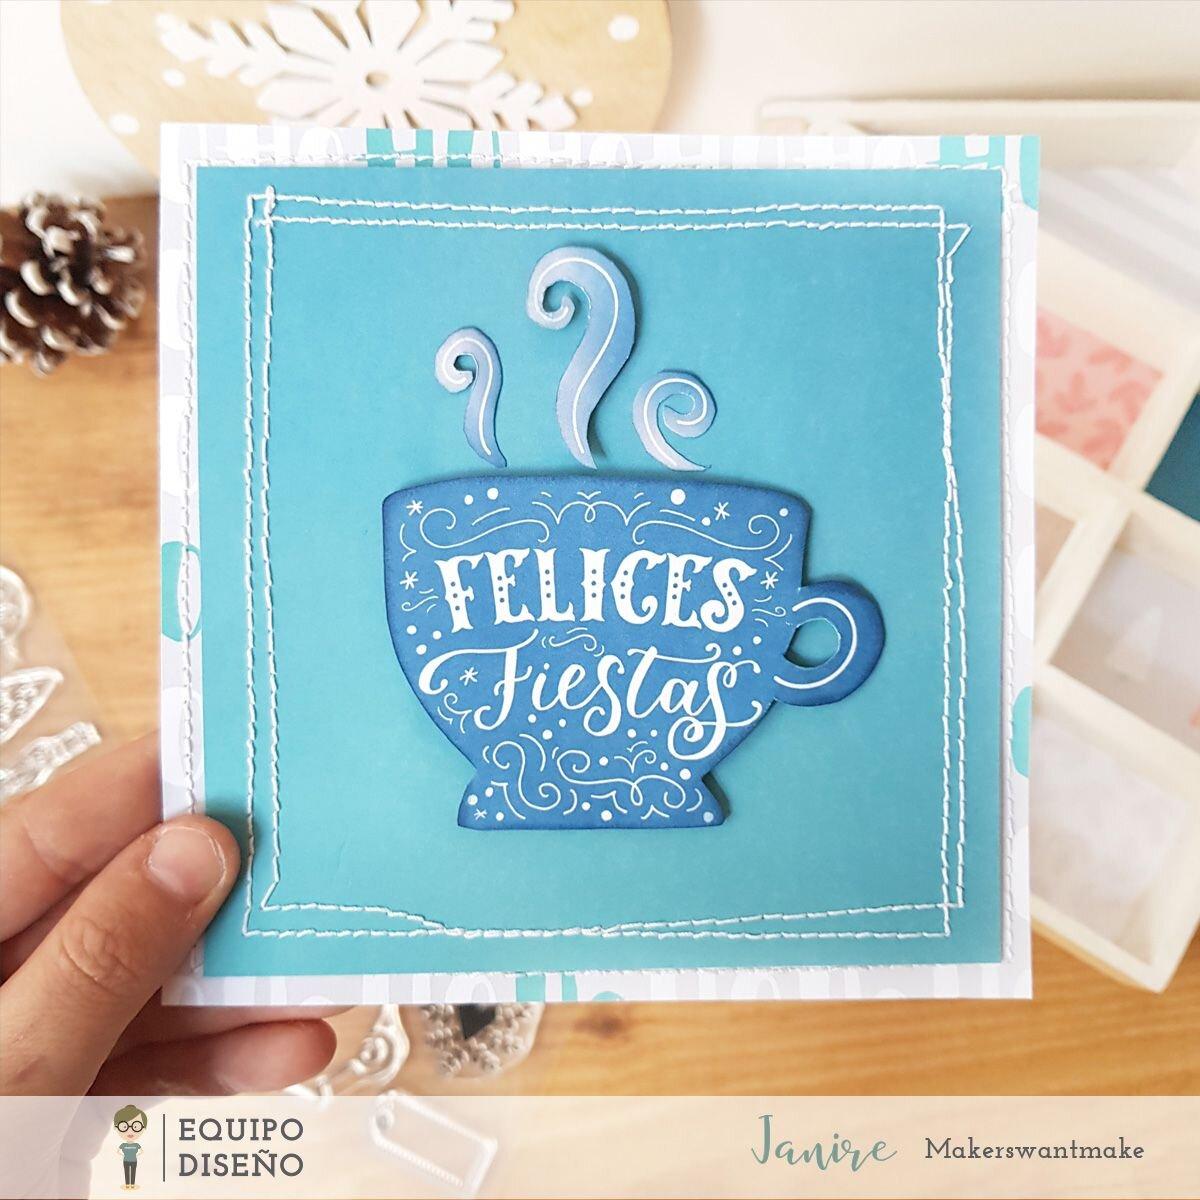 cocoloko-tutorial-tarjetas-navidad-lagom-03.jpg